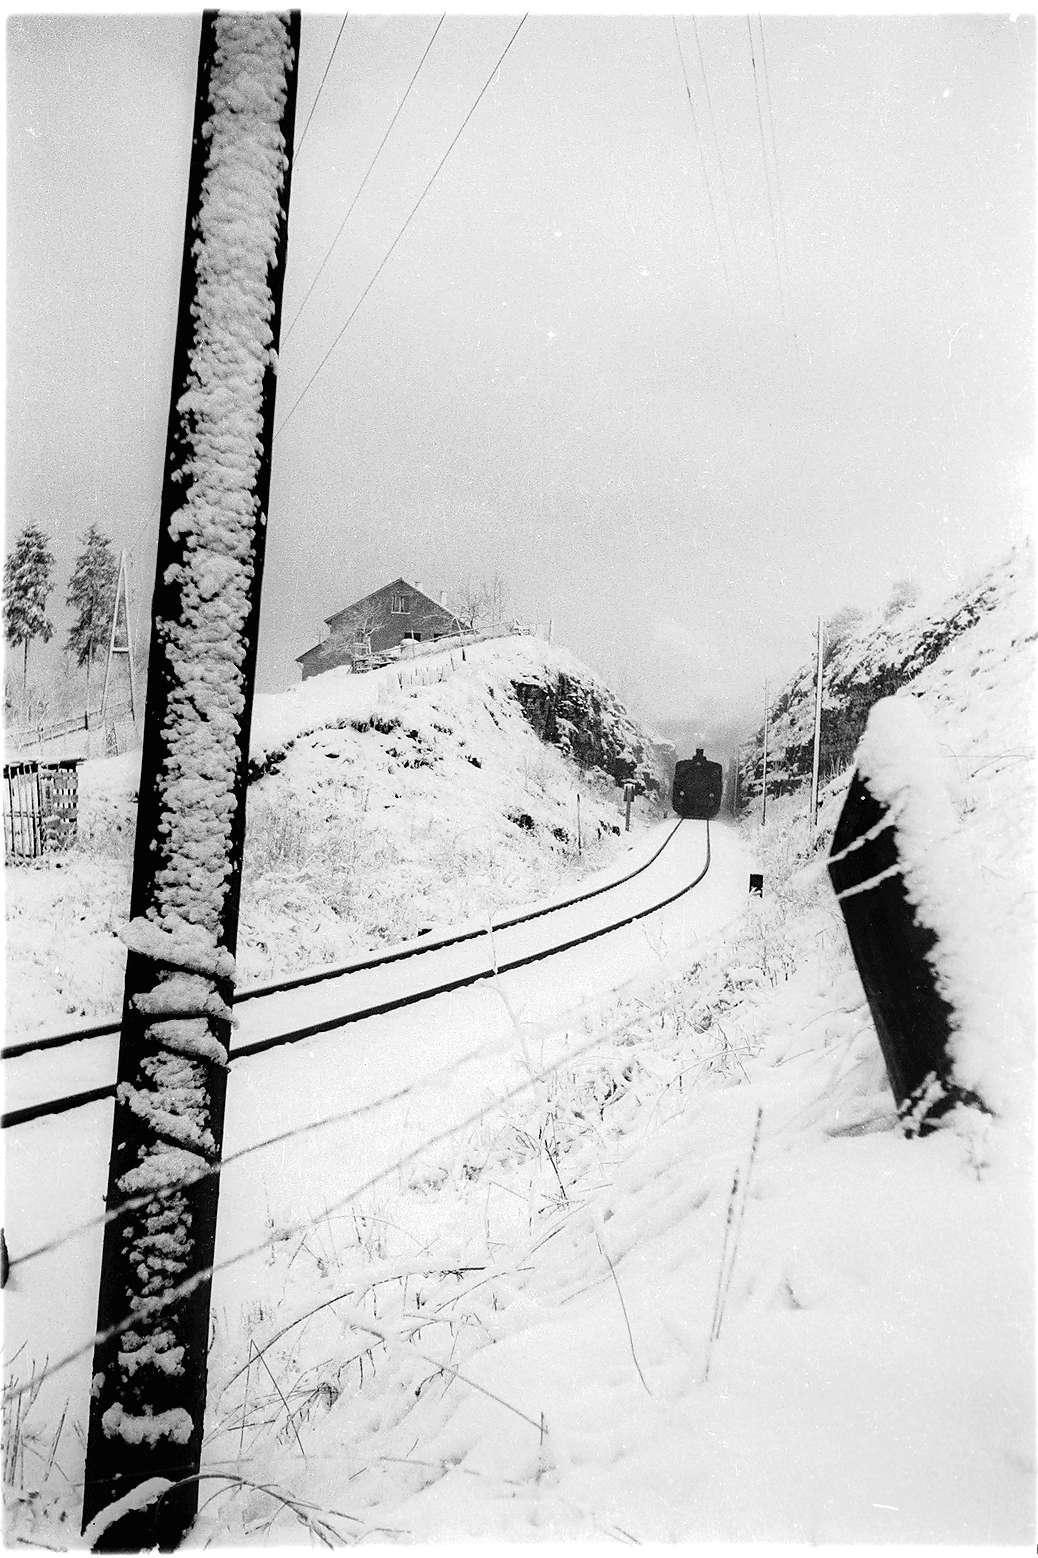 Gammertingen, beim Hummelberg, Lok 21, Güterzug 305, Bild 1